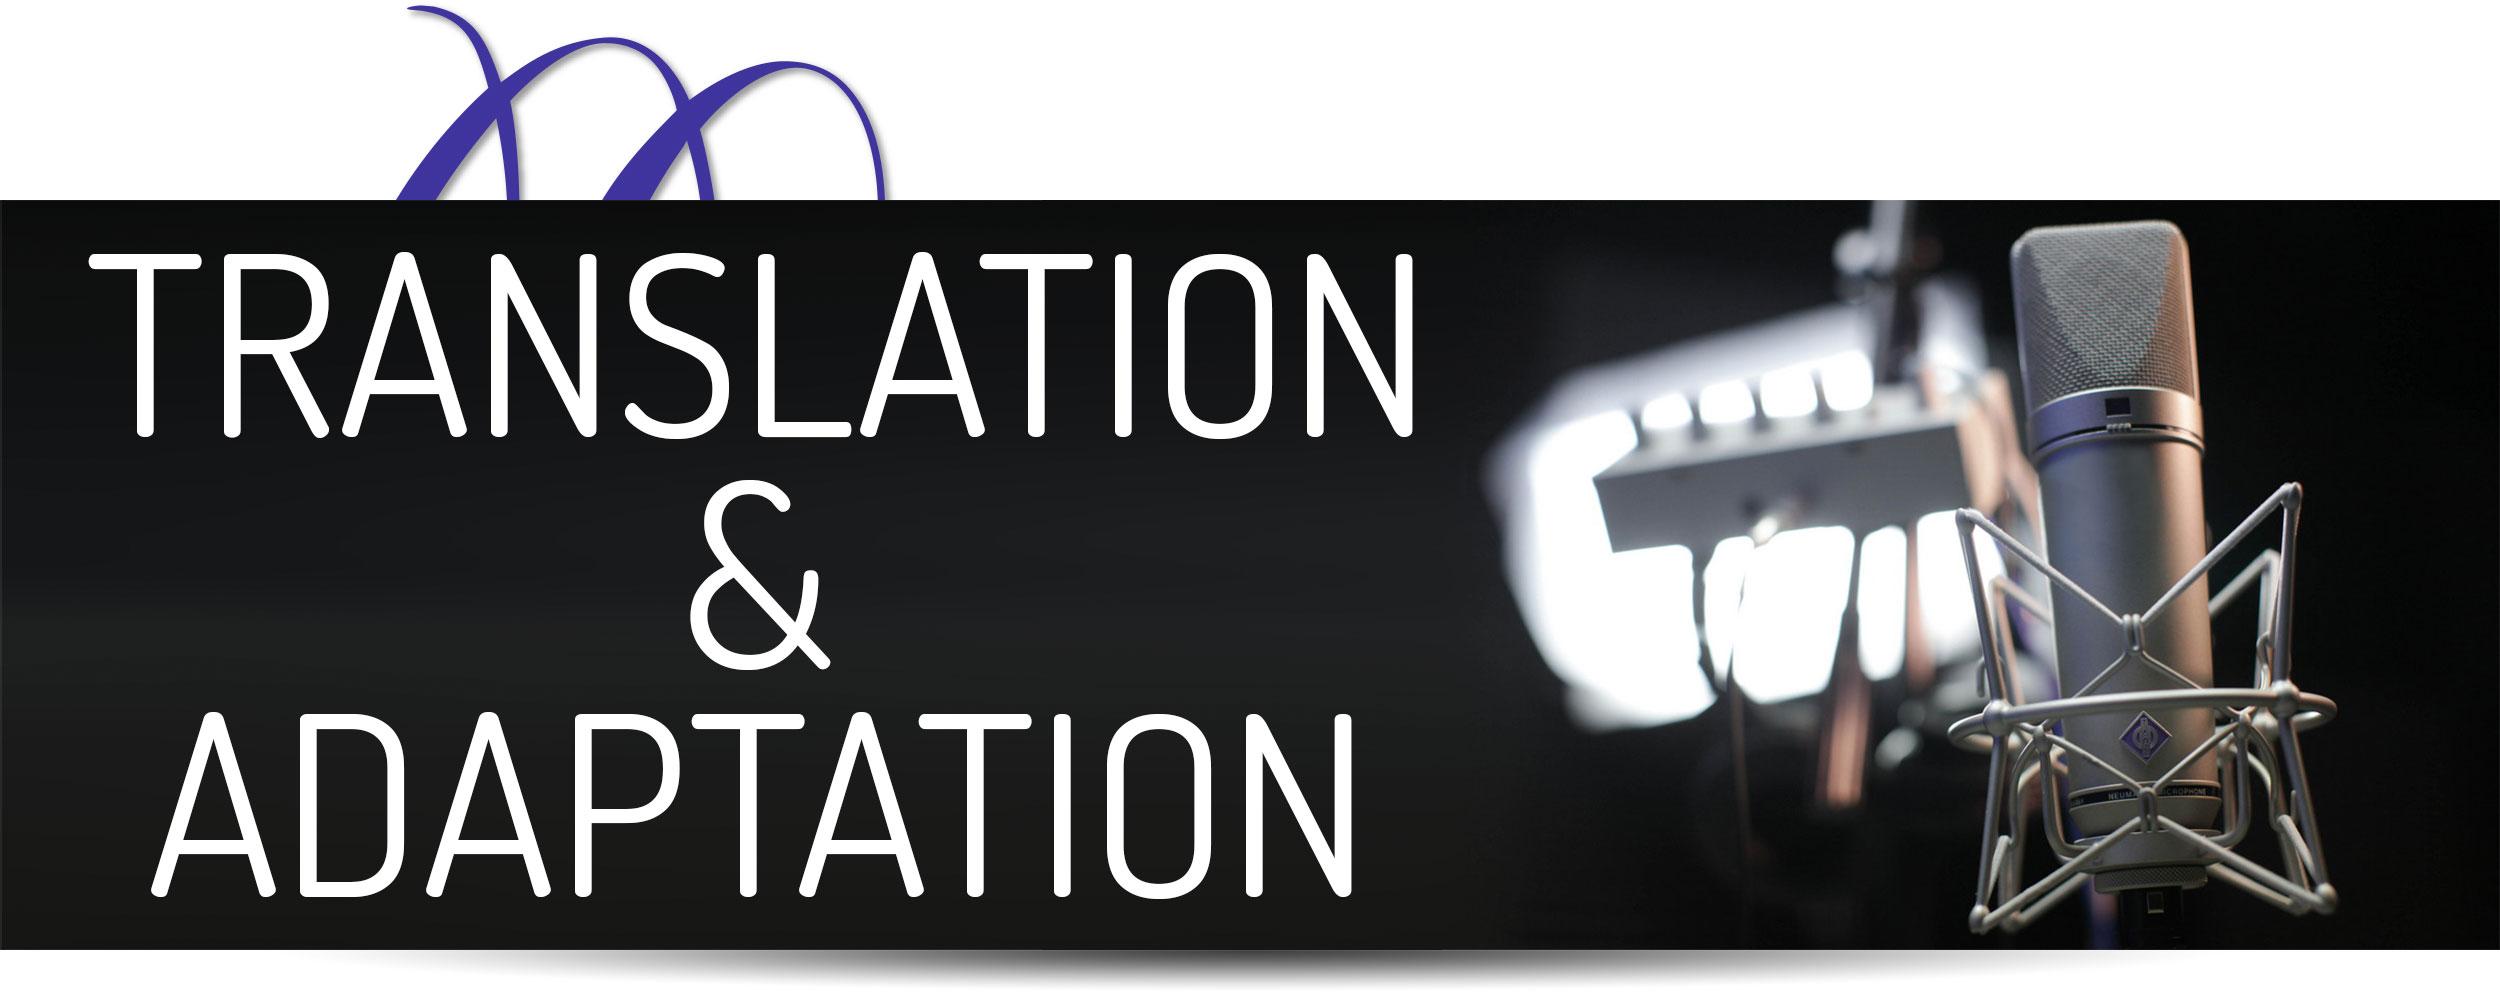 Translation & Adaptation Services